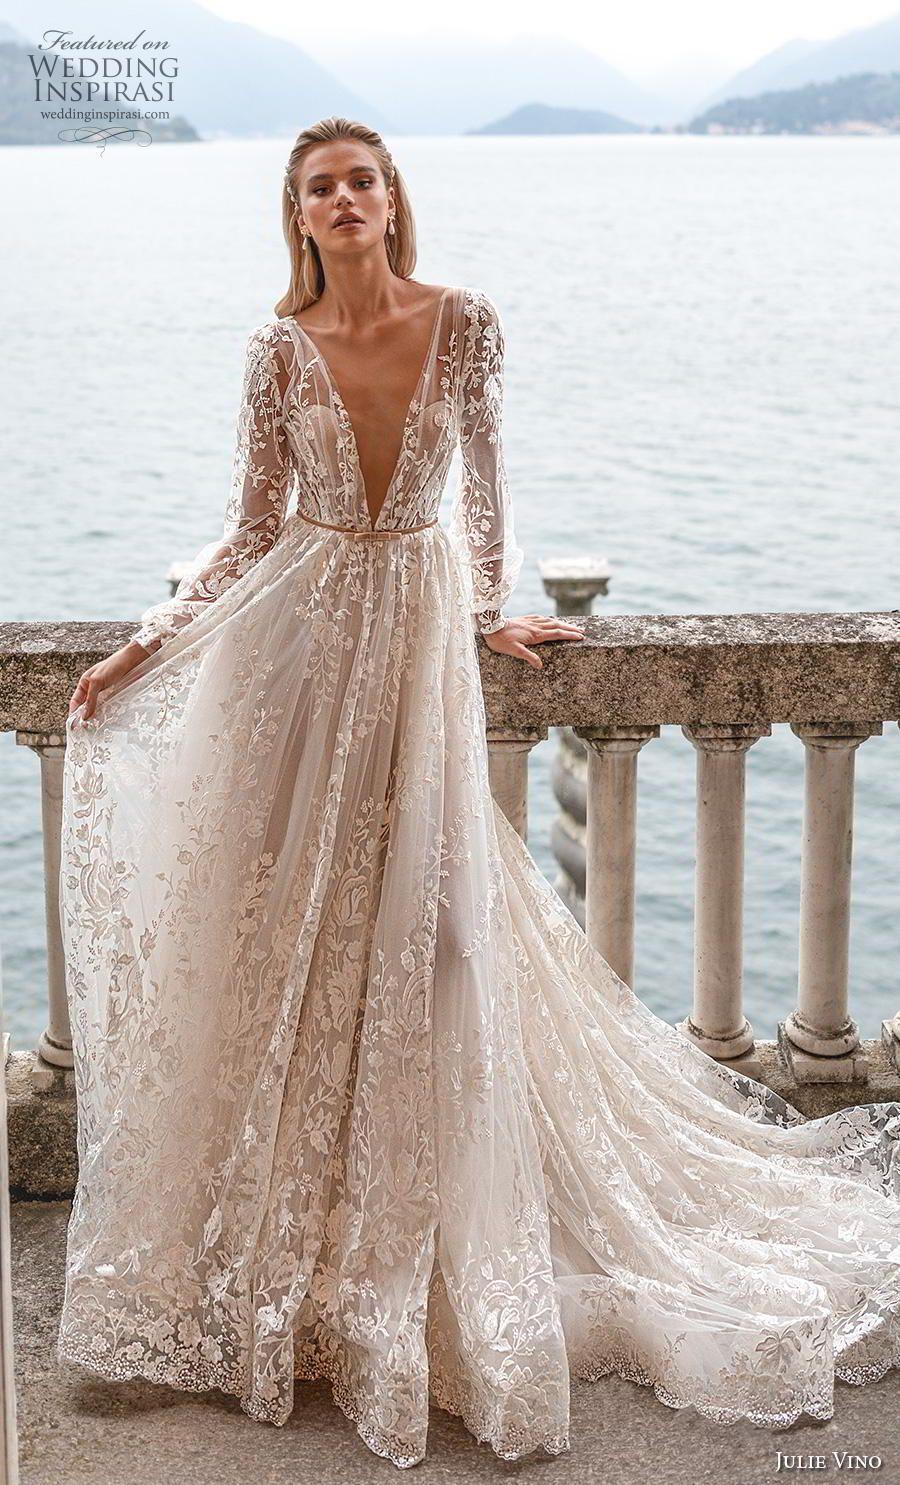 Luce Sposa 2020 Wedding Dresses Greece Campaign Bridal Collection Wedding Inspirasi Elegant Wedding Dress Modest Wedding Dresses Wedding Dress Guide [ 1485 x 900 Pixel ]